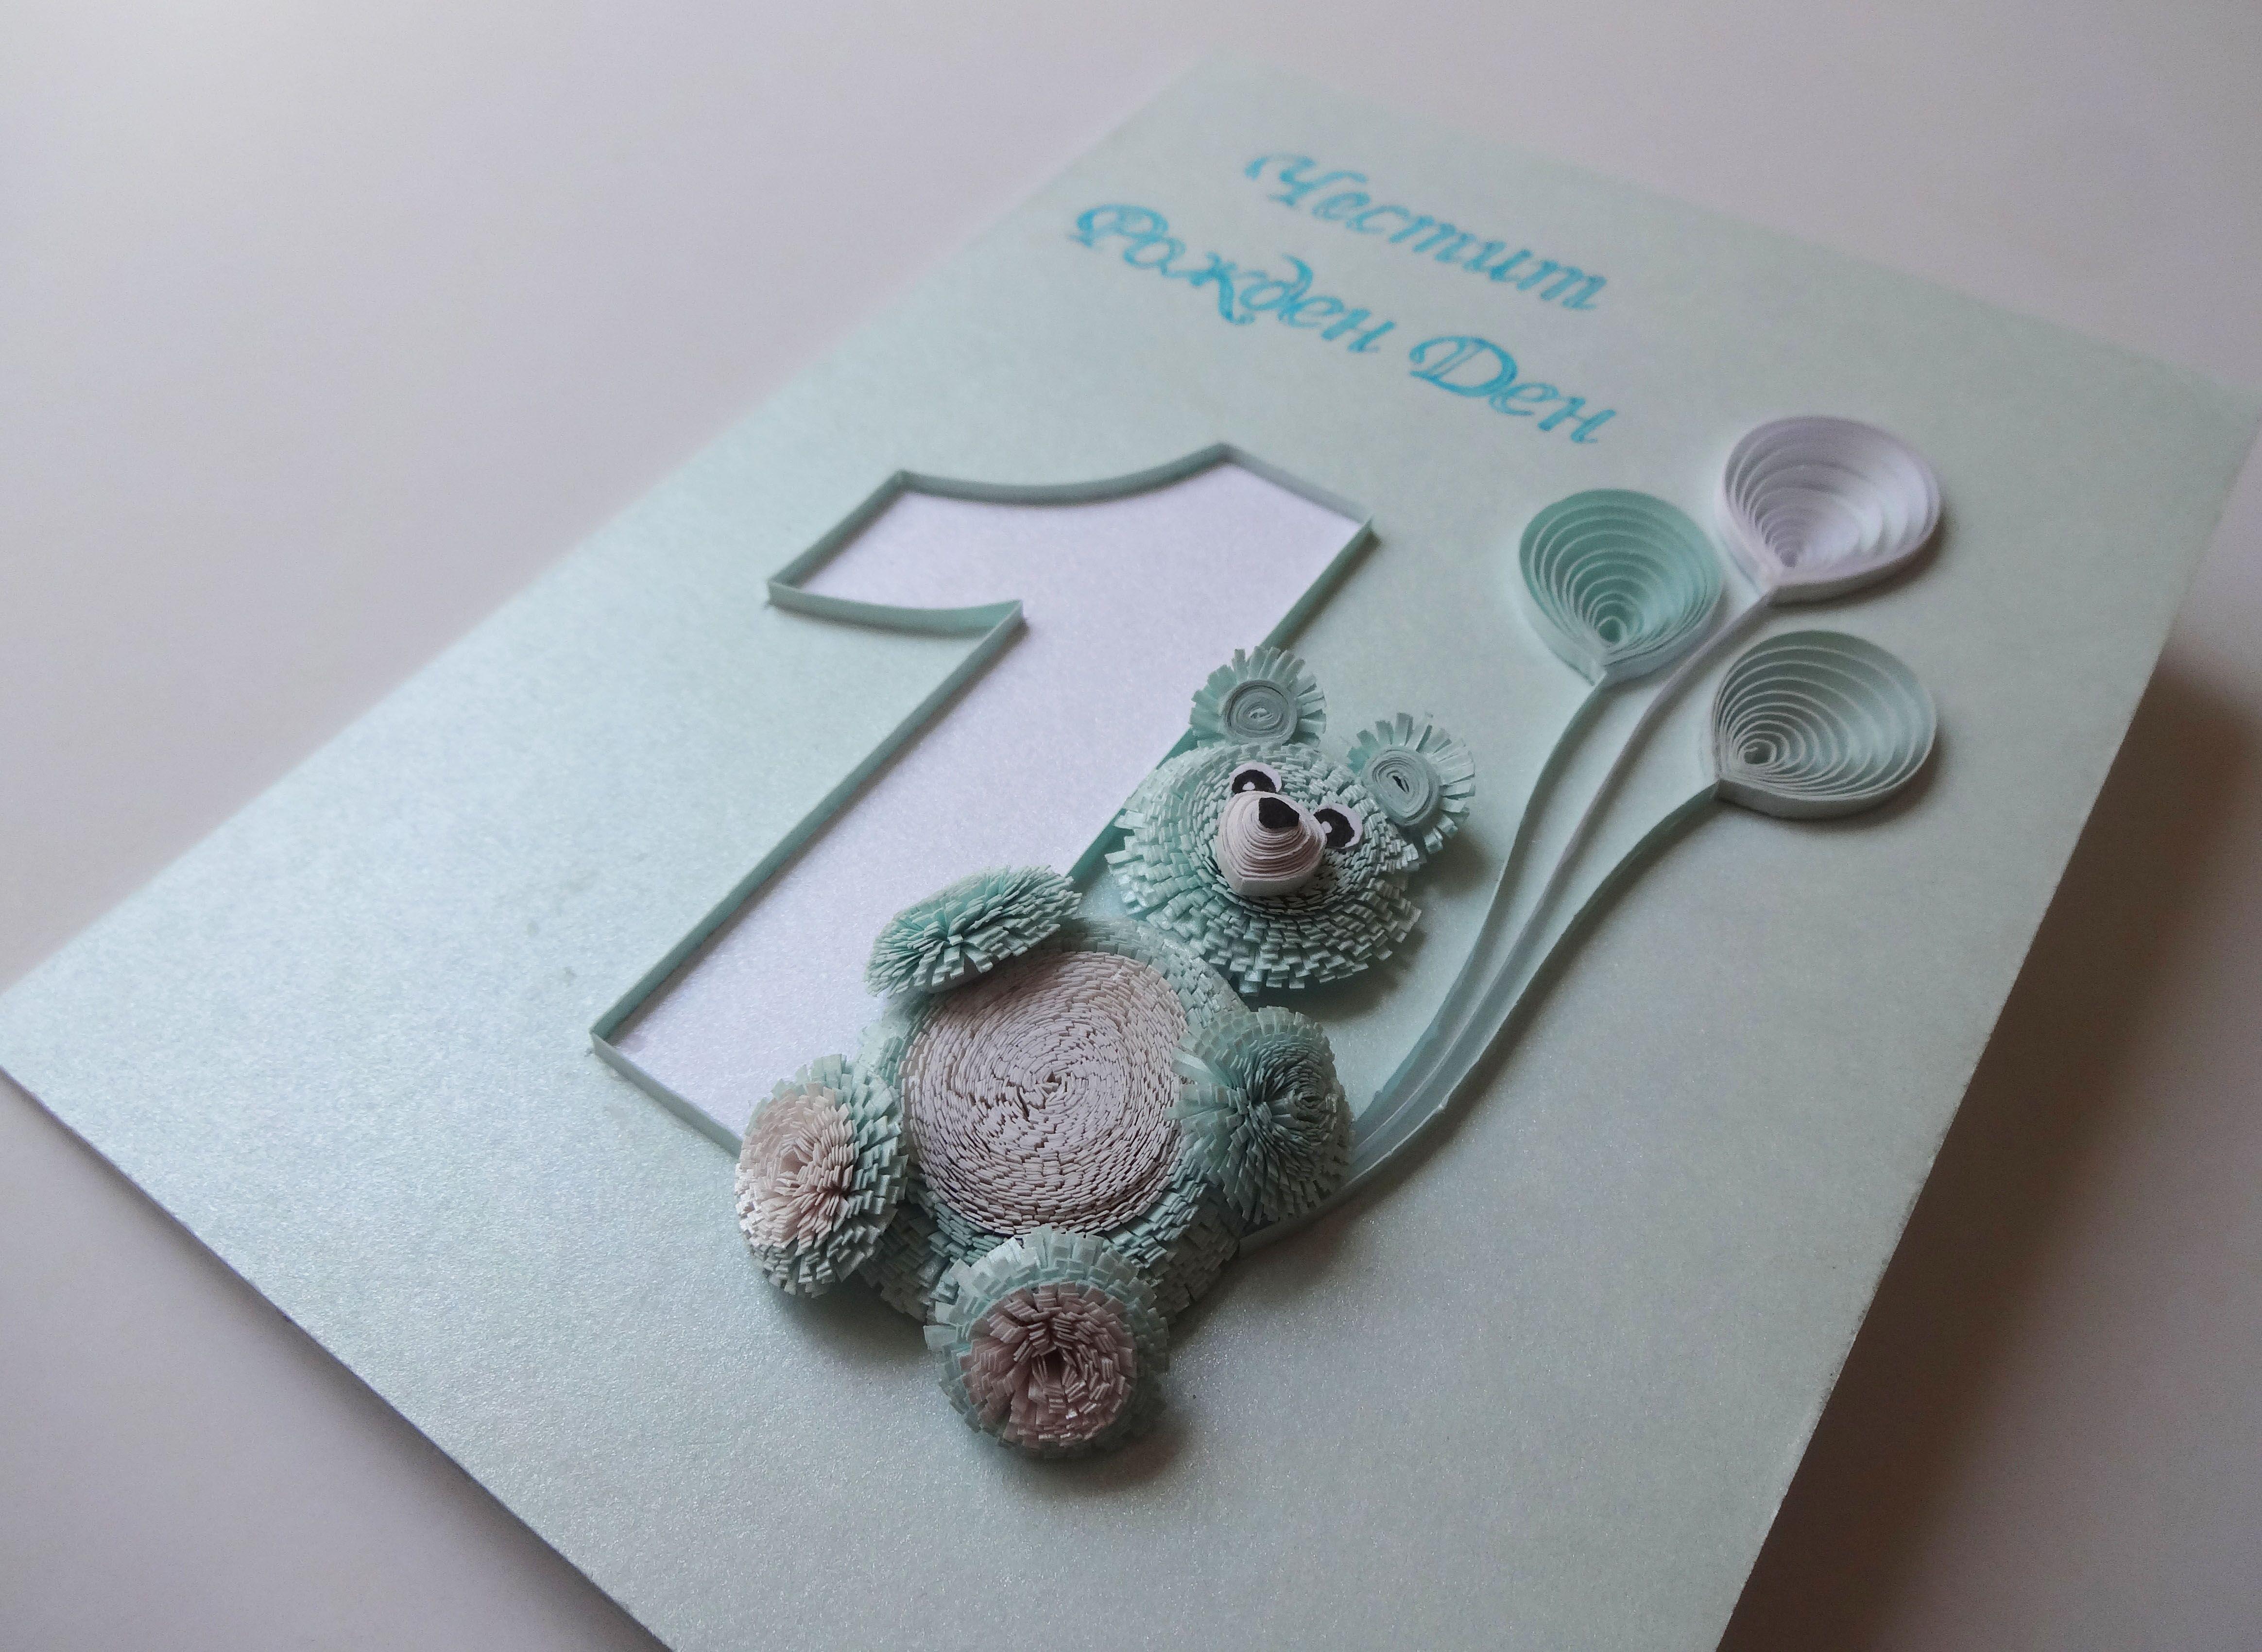 Quilled 1st Birthday Card with Teddy Bear by TipTopArtShop